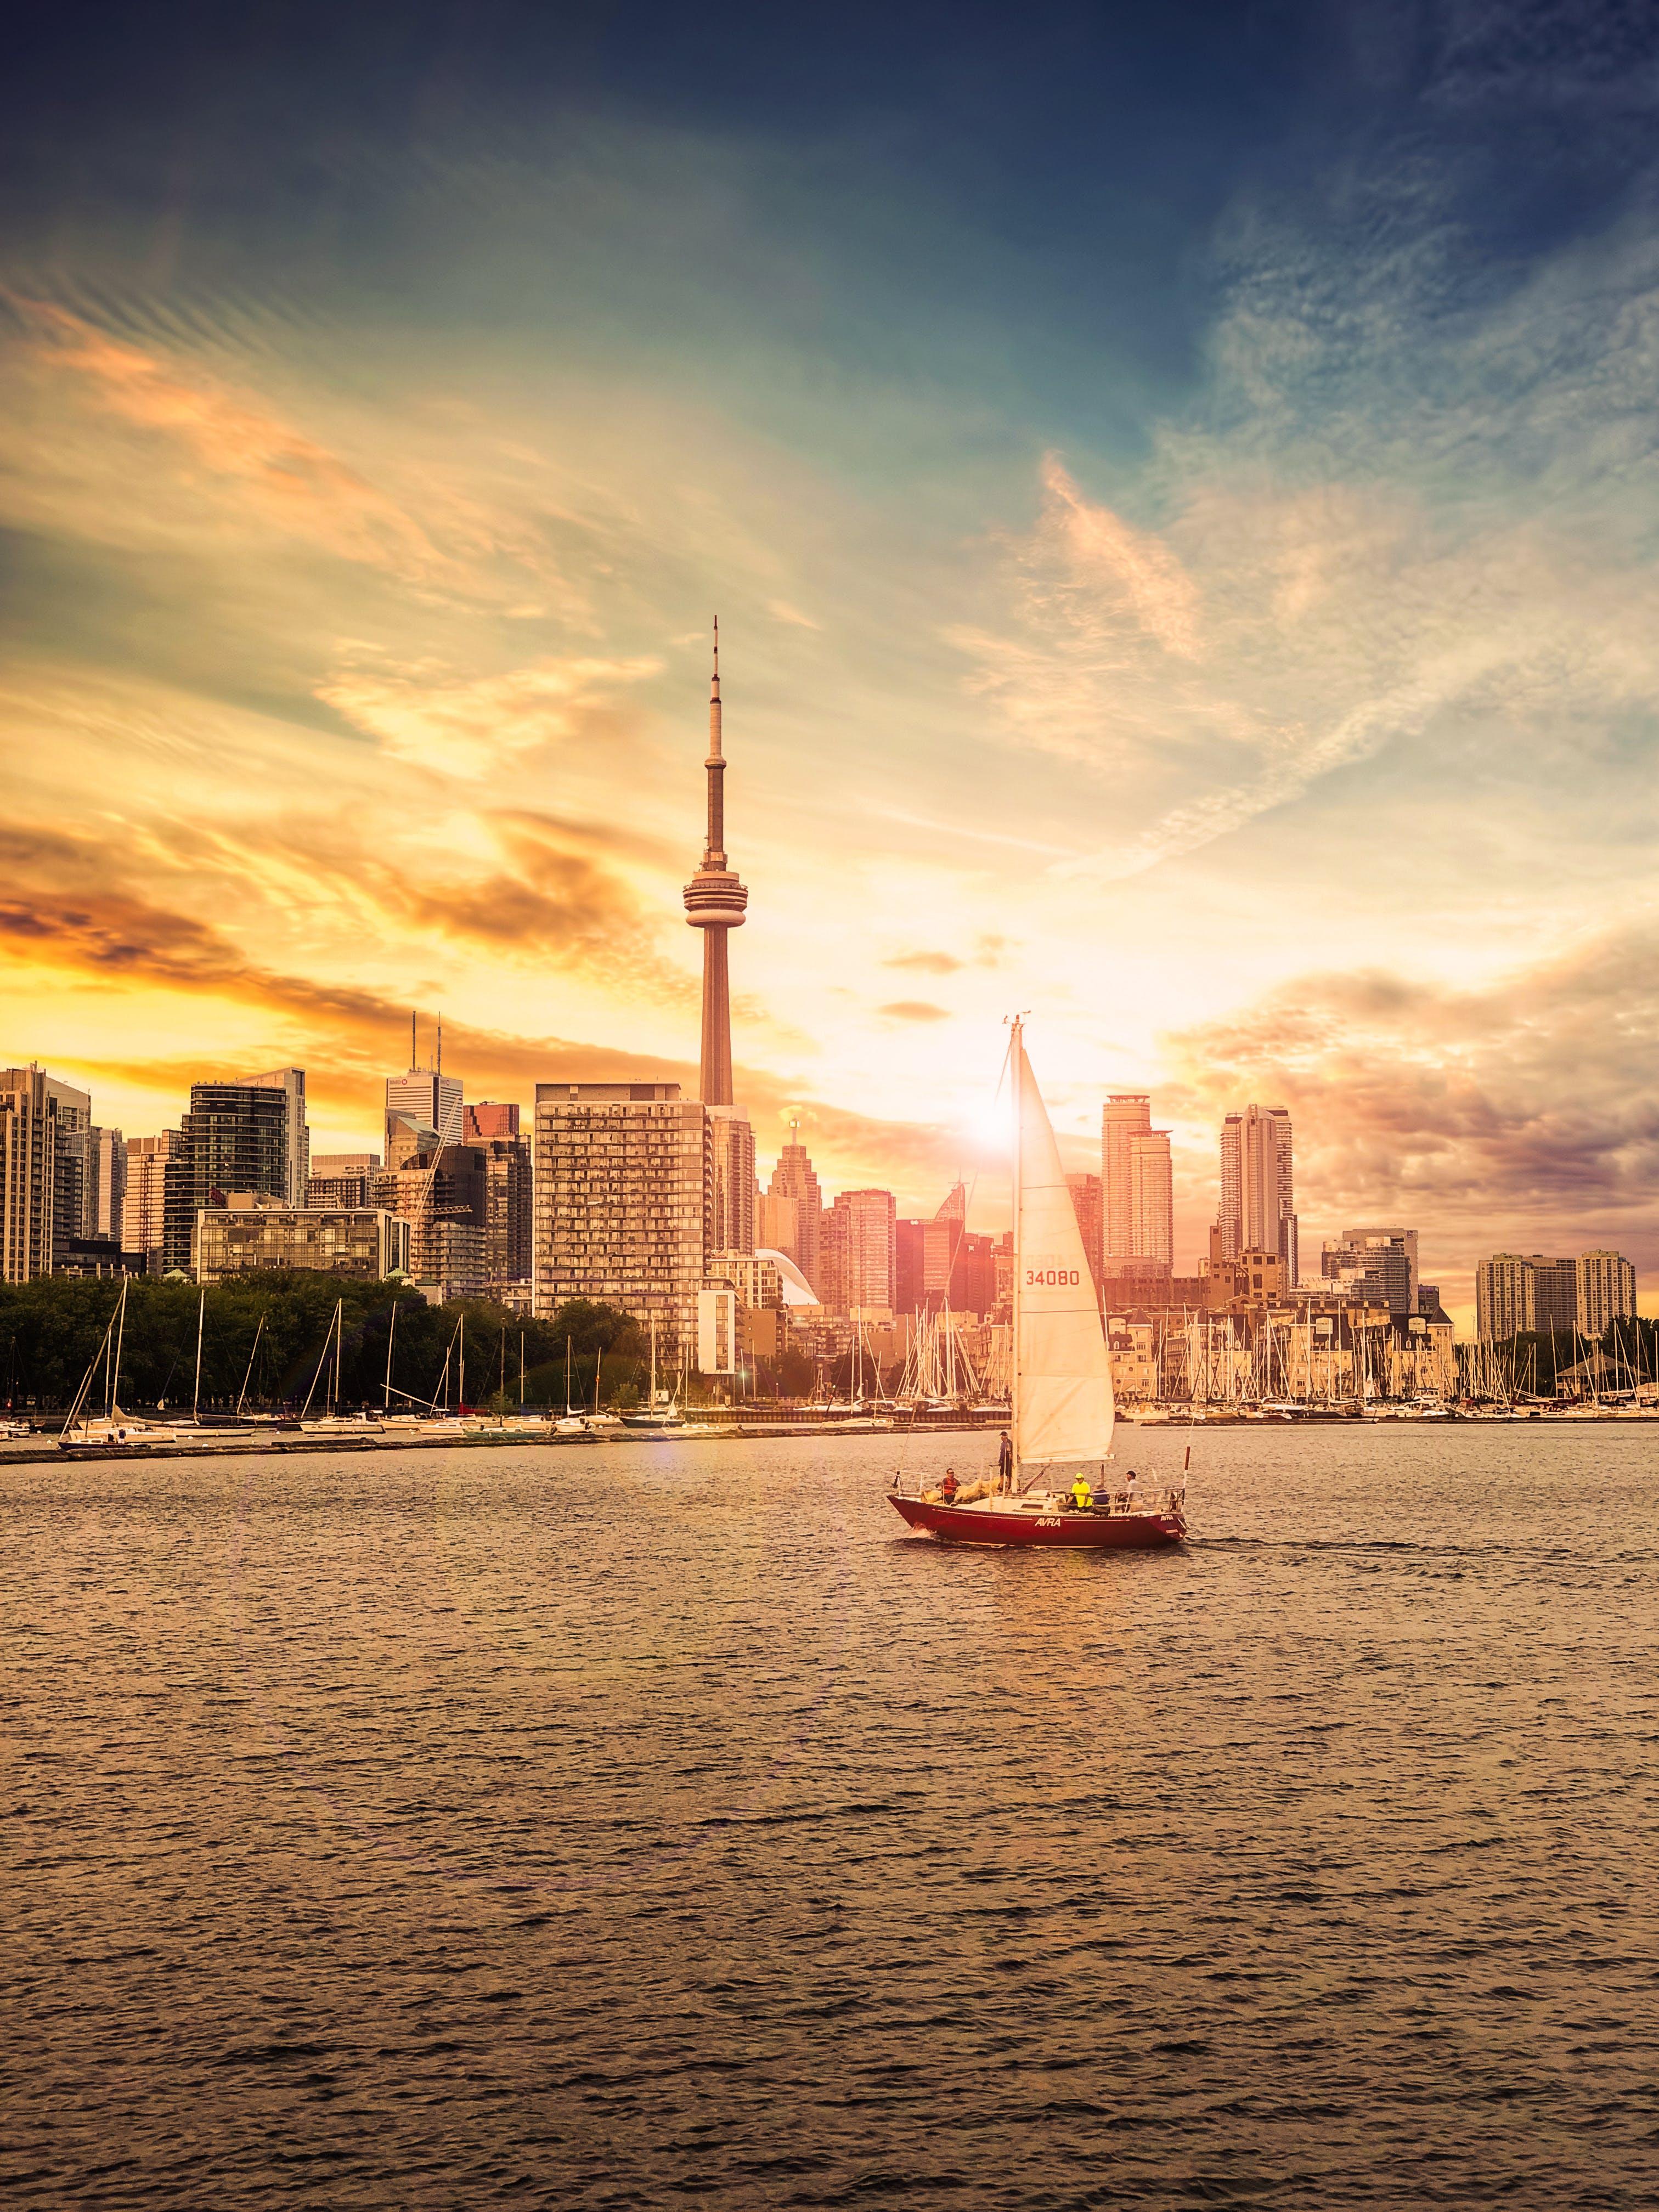 Free stock photo of sunset, skyline, summer, boat